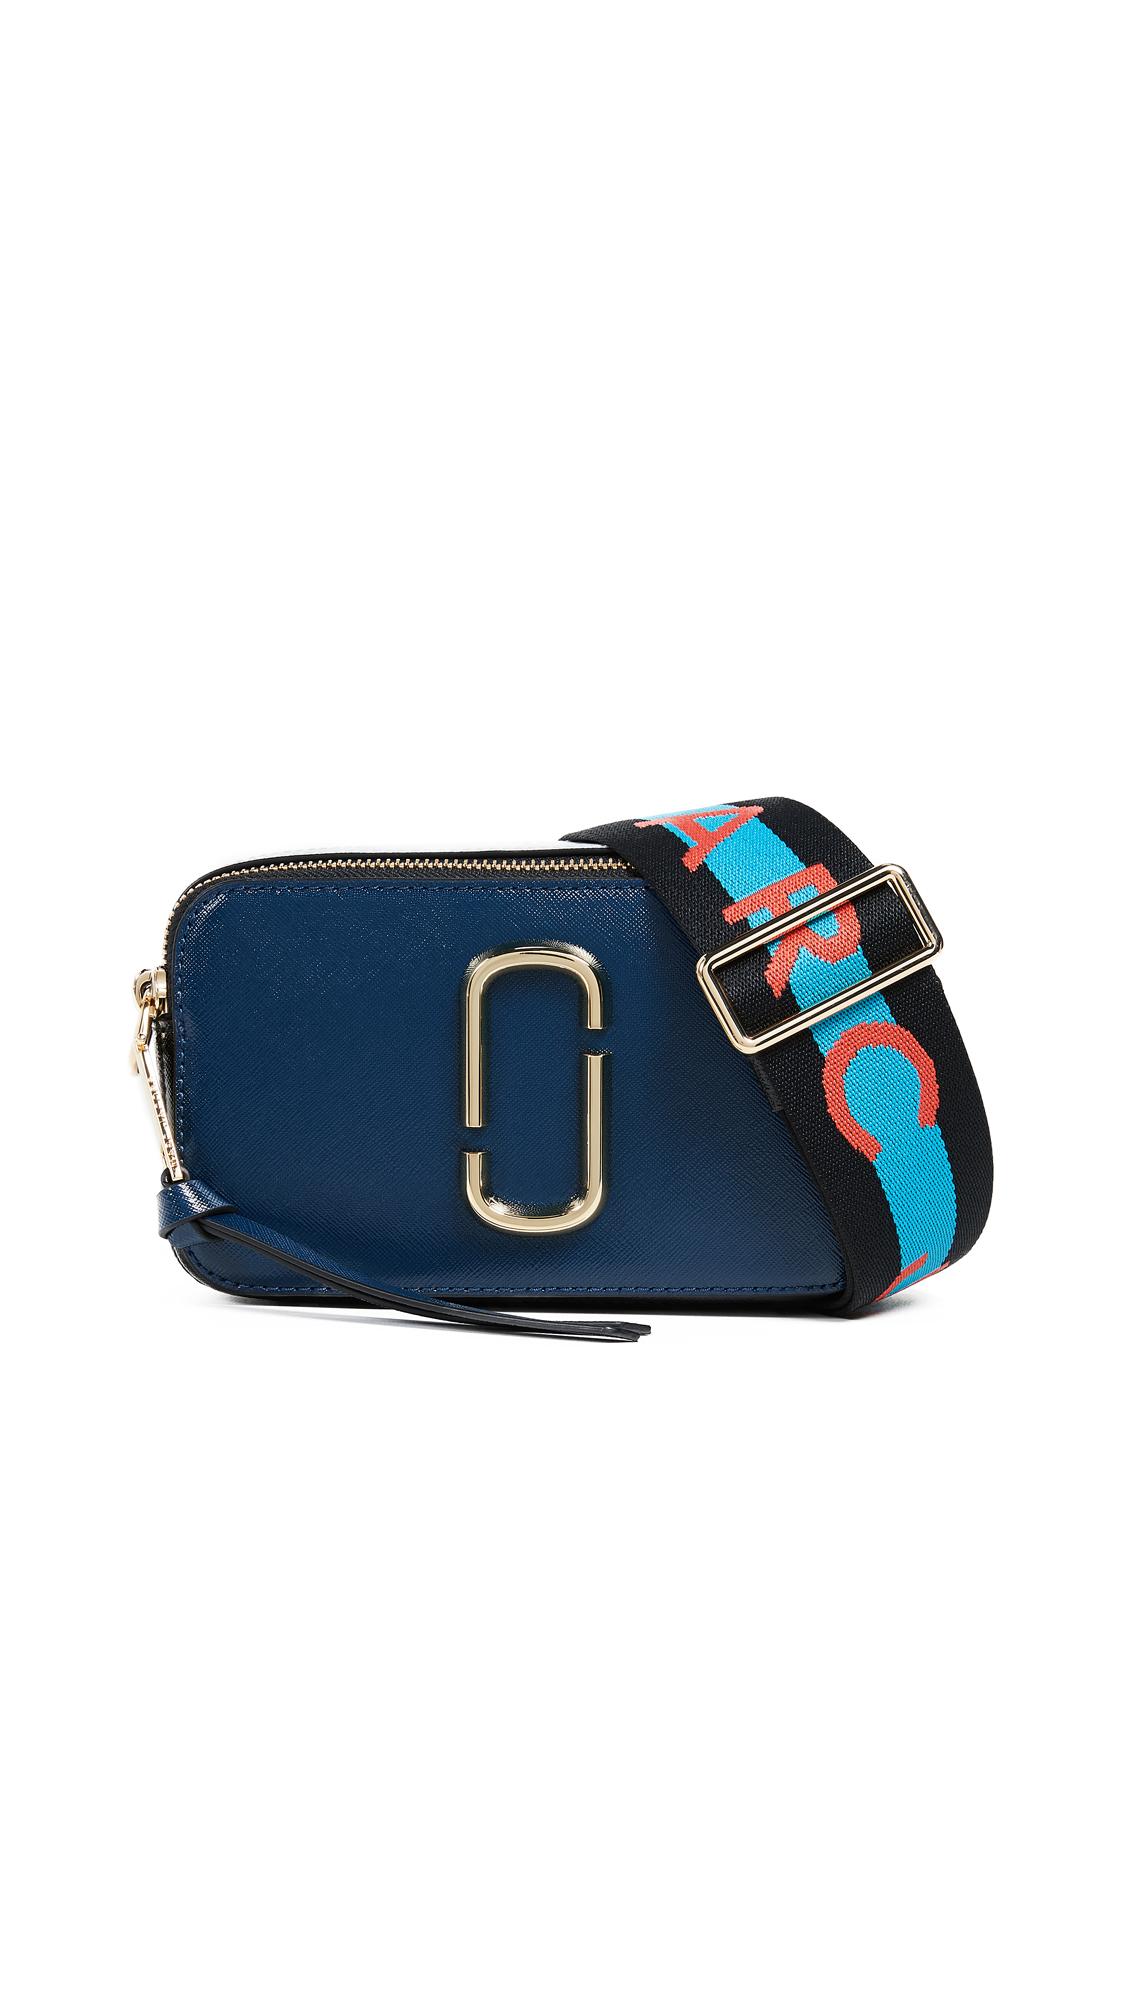 Marc Jacobs Snapshot Camera Bag - Blue Sea Multi